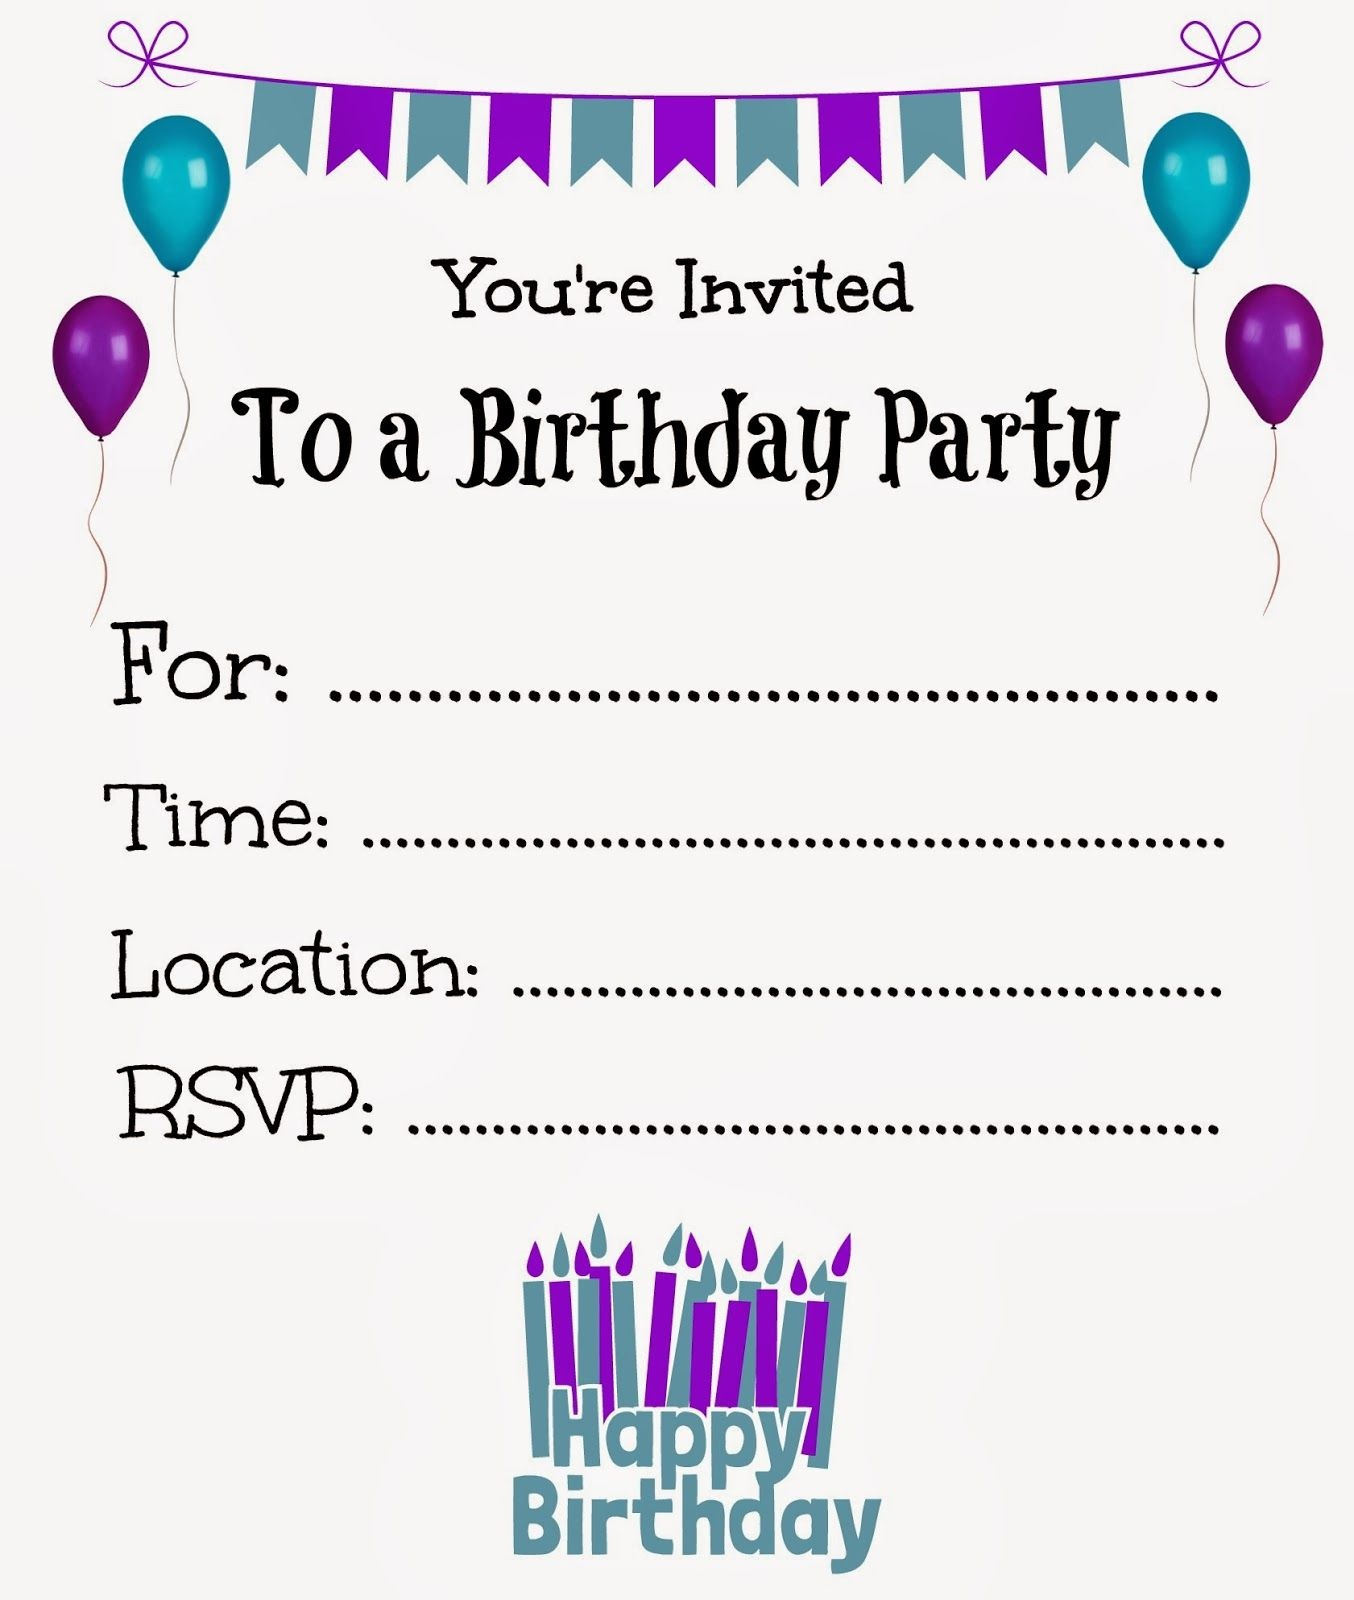 Free Printable Birthday Invitations For Kids #freeprintables - Free Printable Invitations